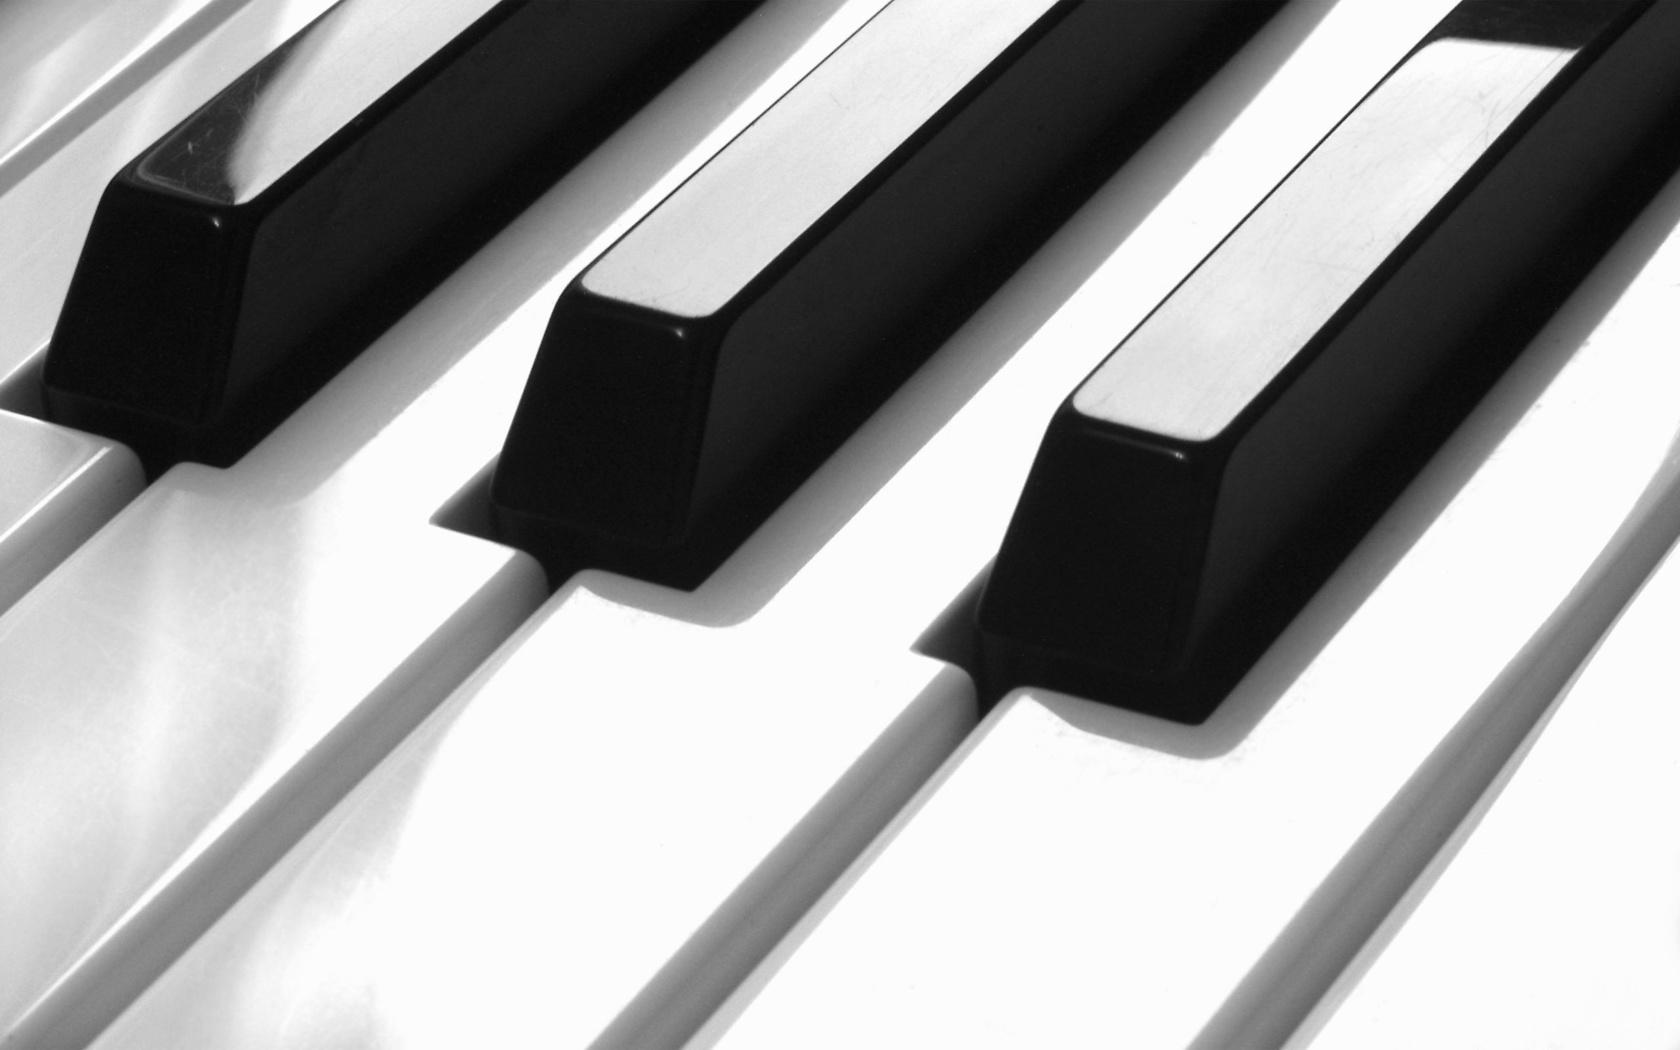 музыка, клавиши, рояль, пианино, минимализм